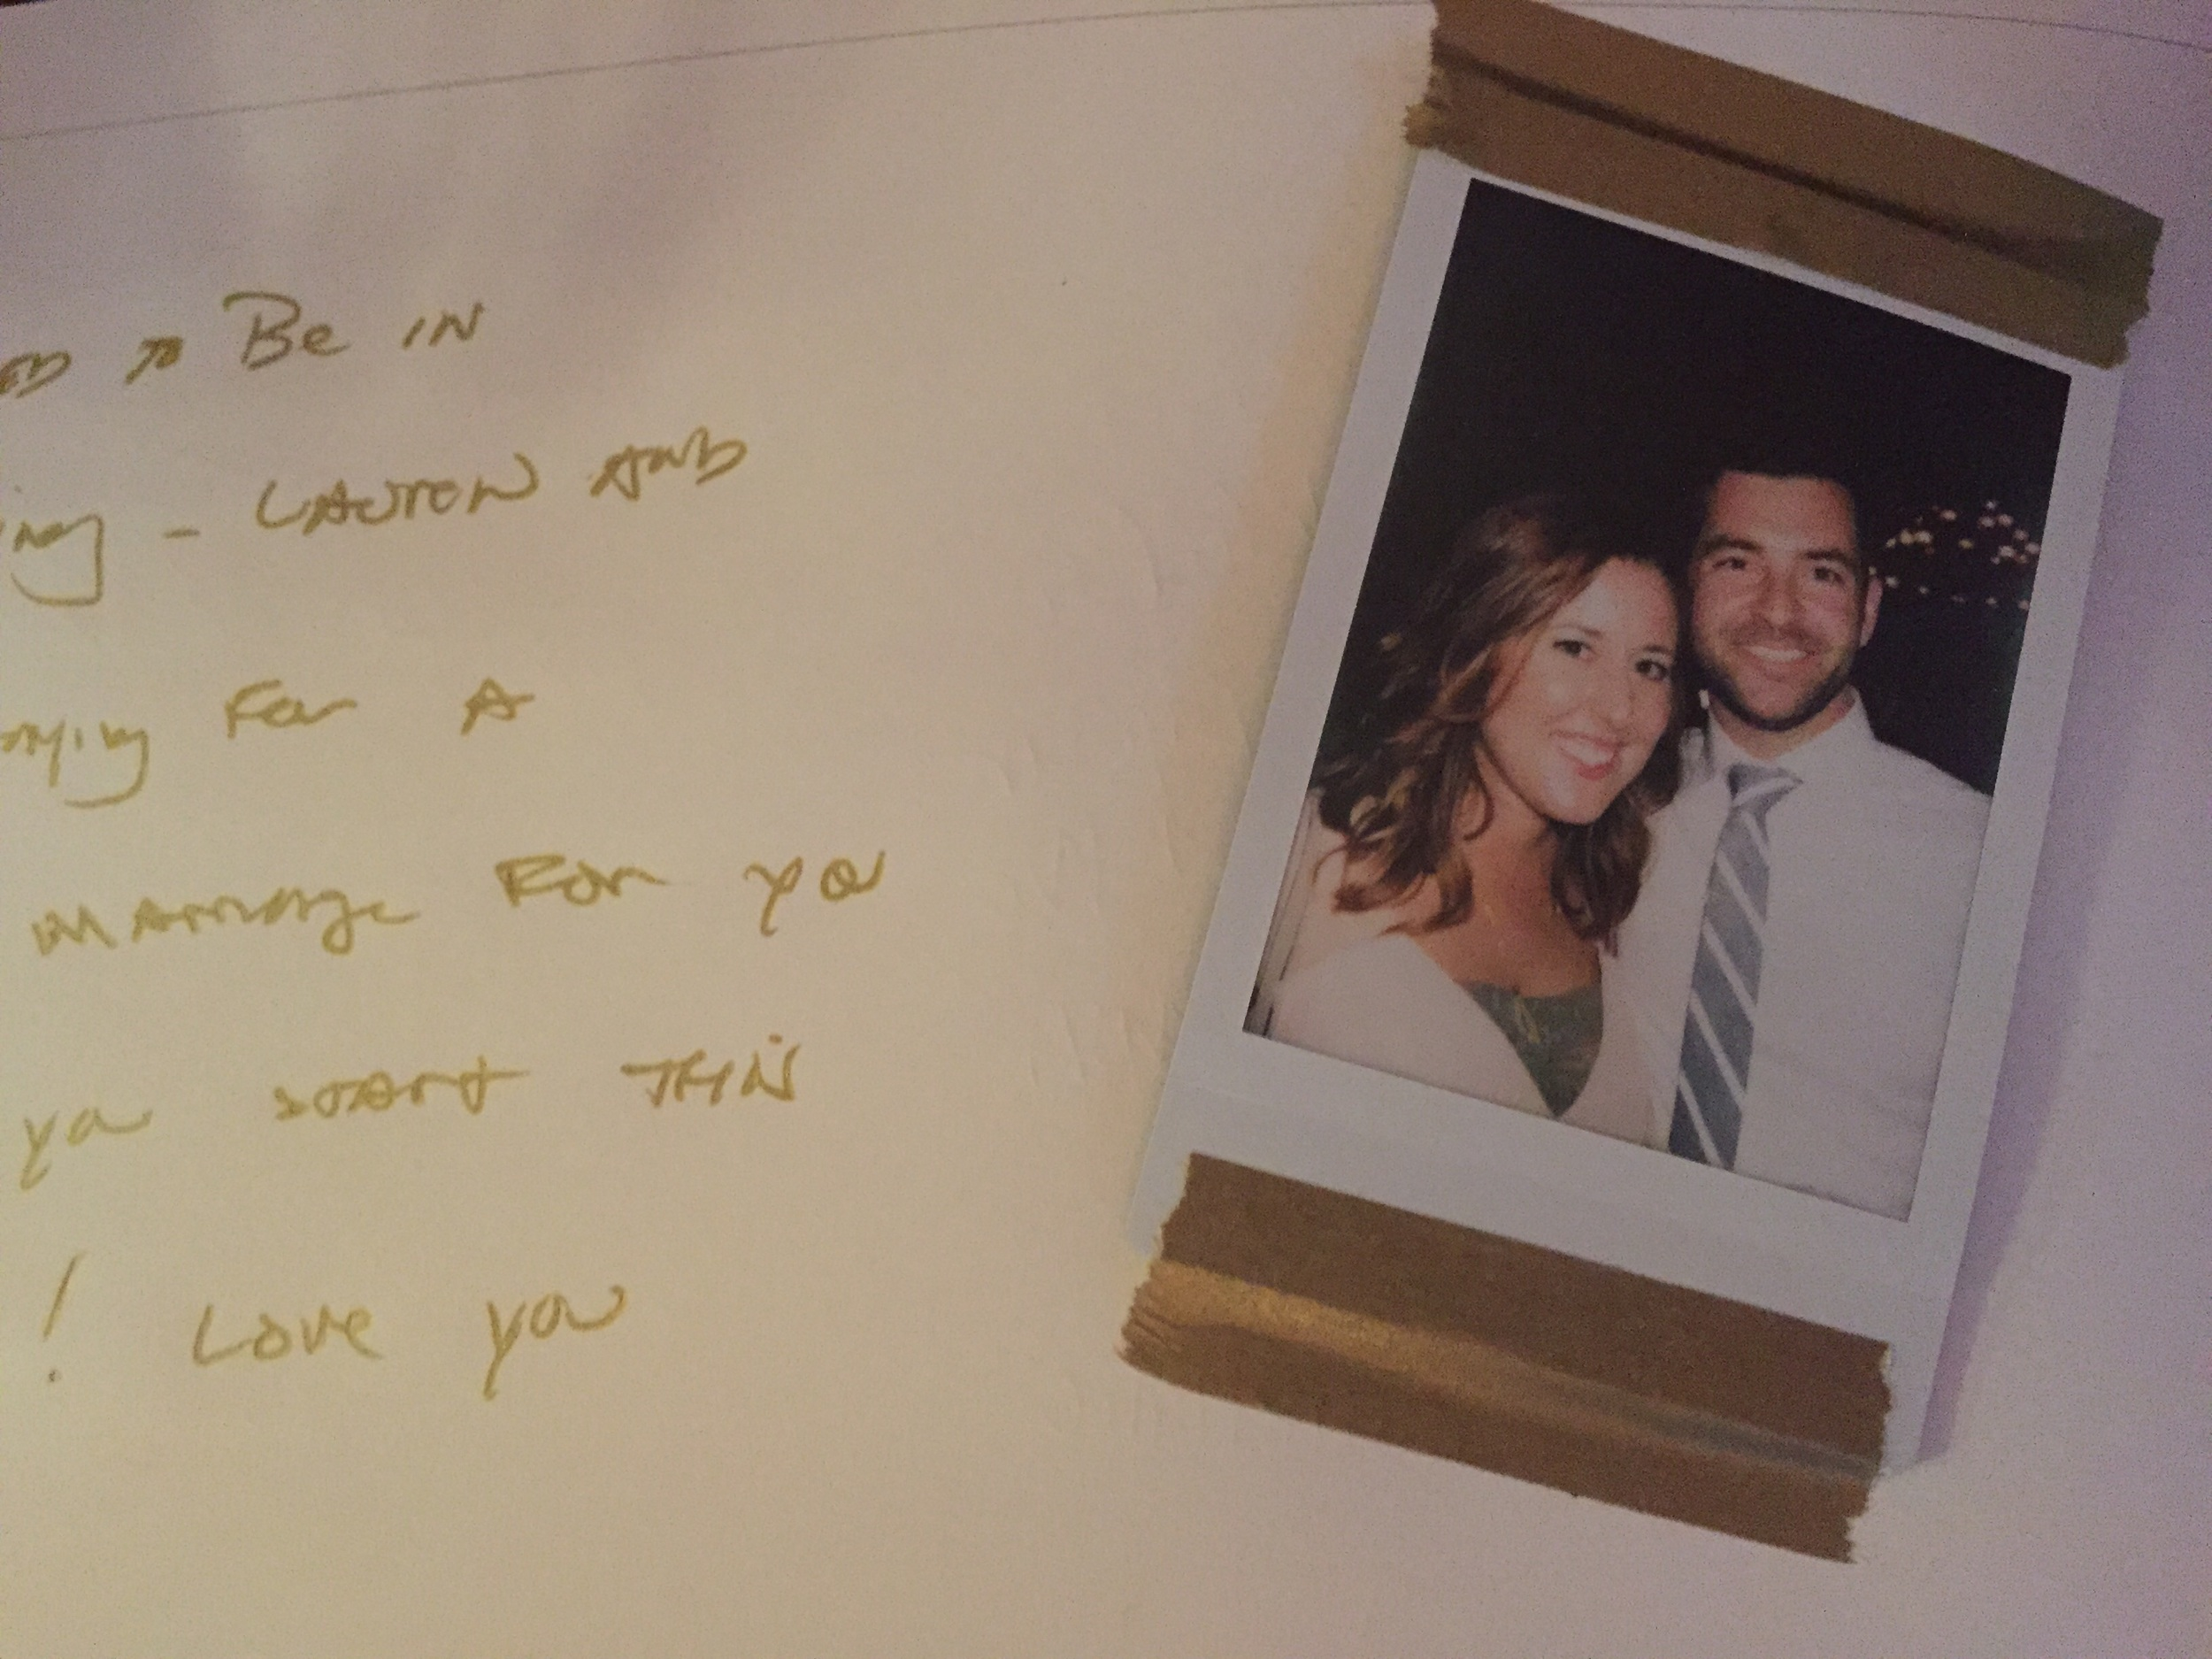 Polaroids in the guest book.